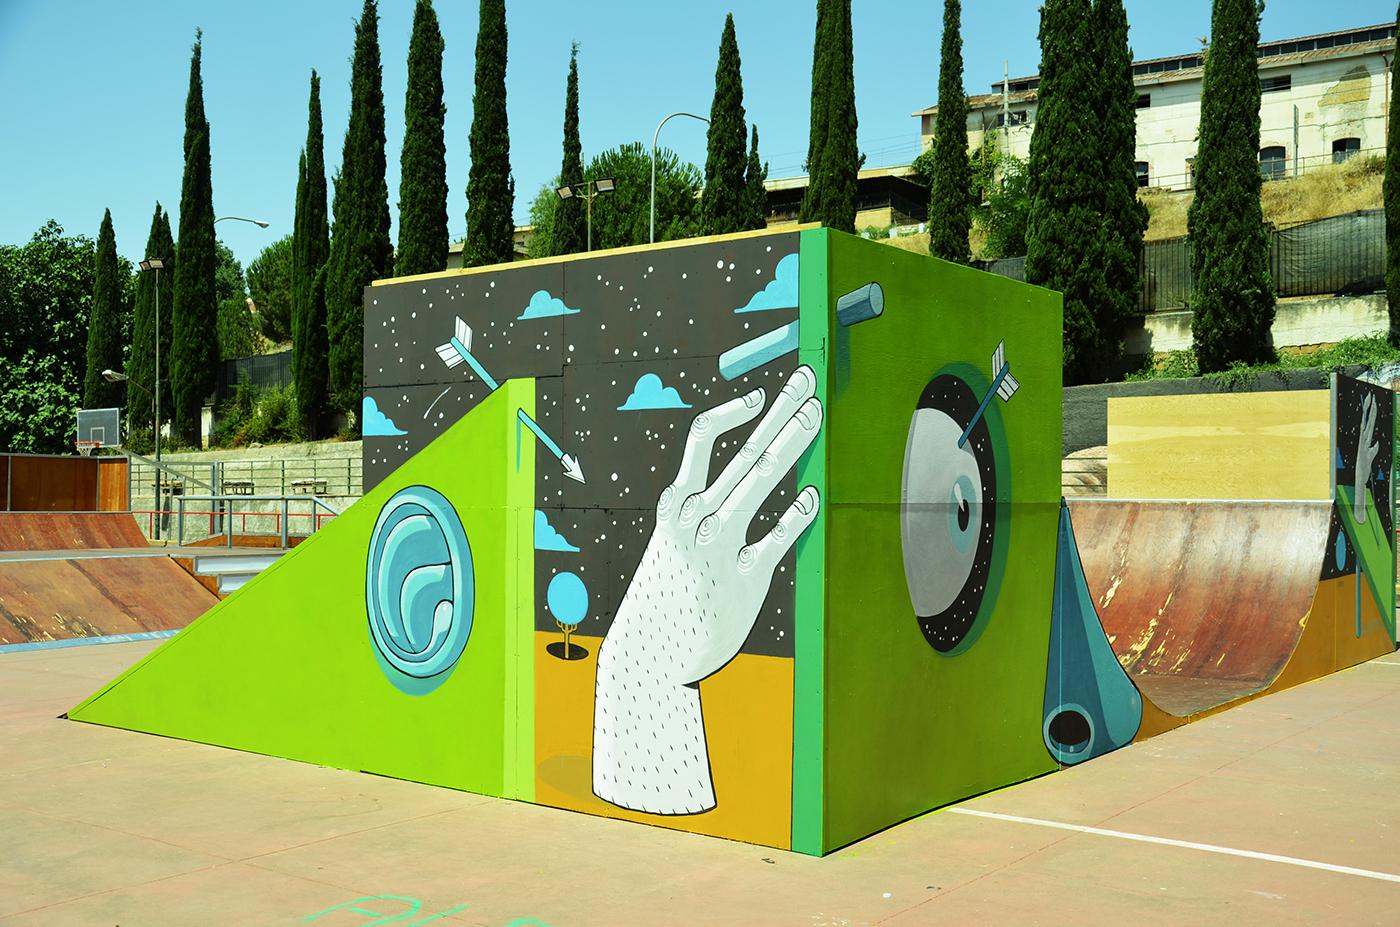 diego della posta mister thoms street art skatepark3 - Mister Thoms : skatepark arty et fresque 3D